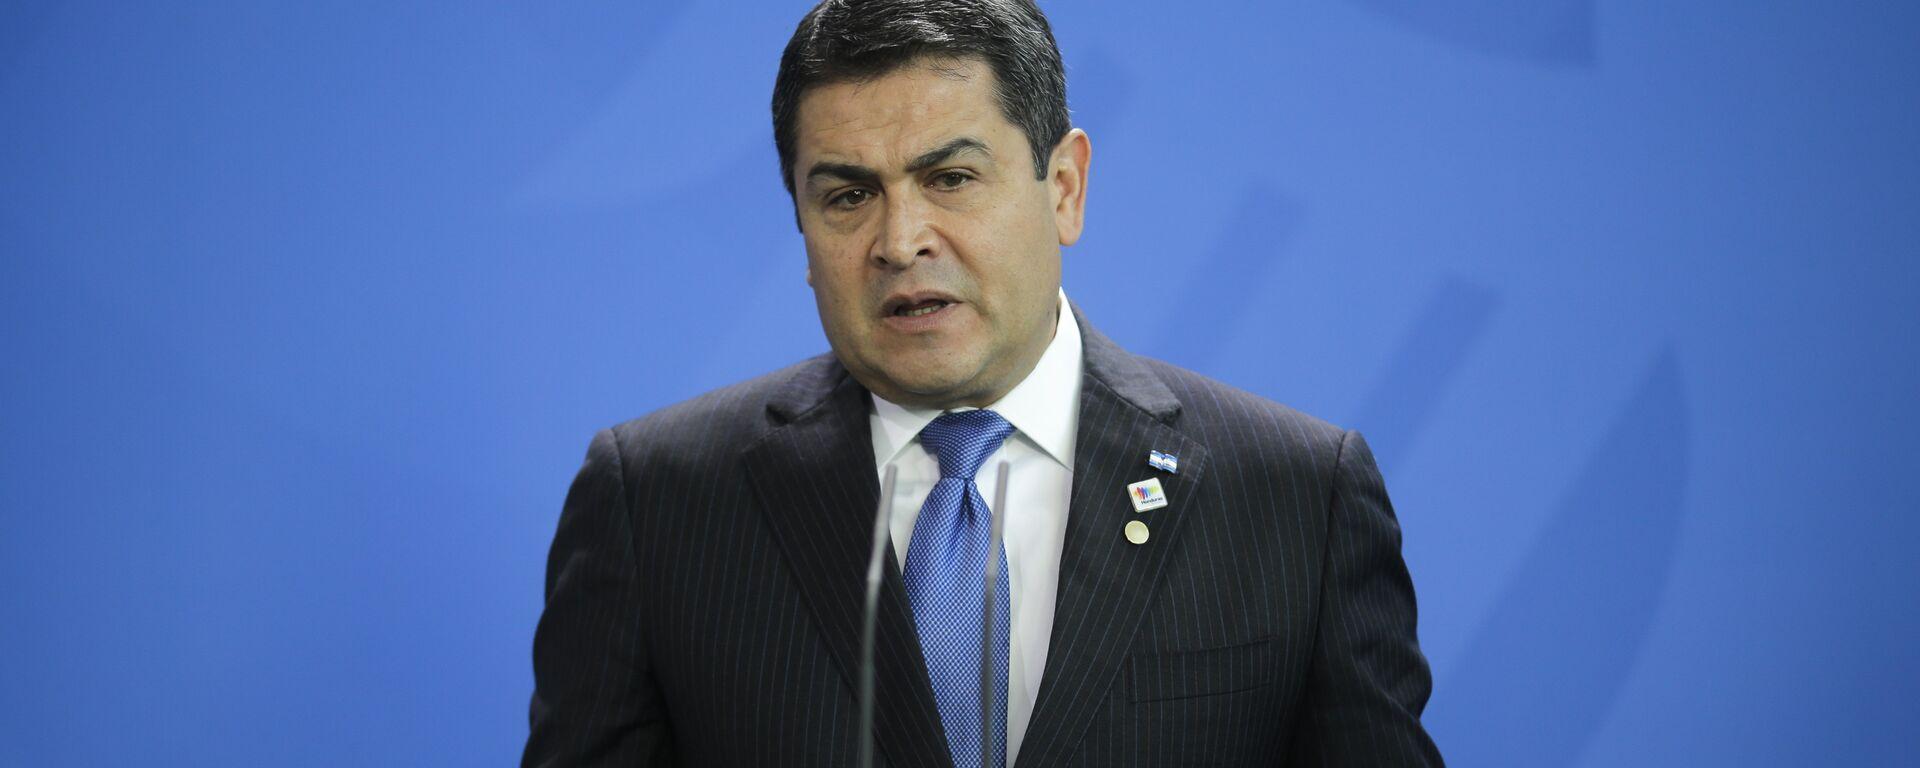 Juan Orlando Hernández, presidente de Honduras - Sputnik Mundo, 1920, 24.06.2021